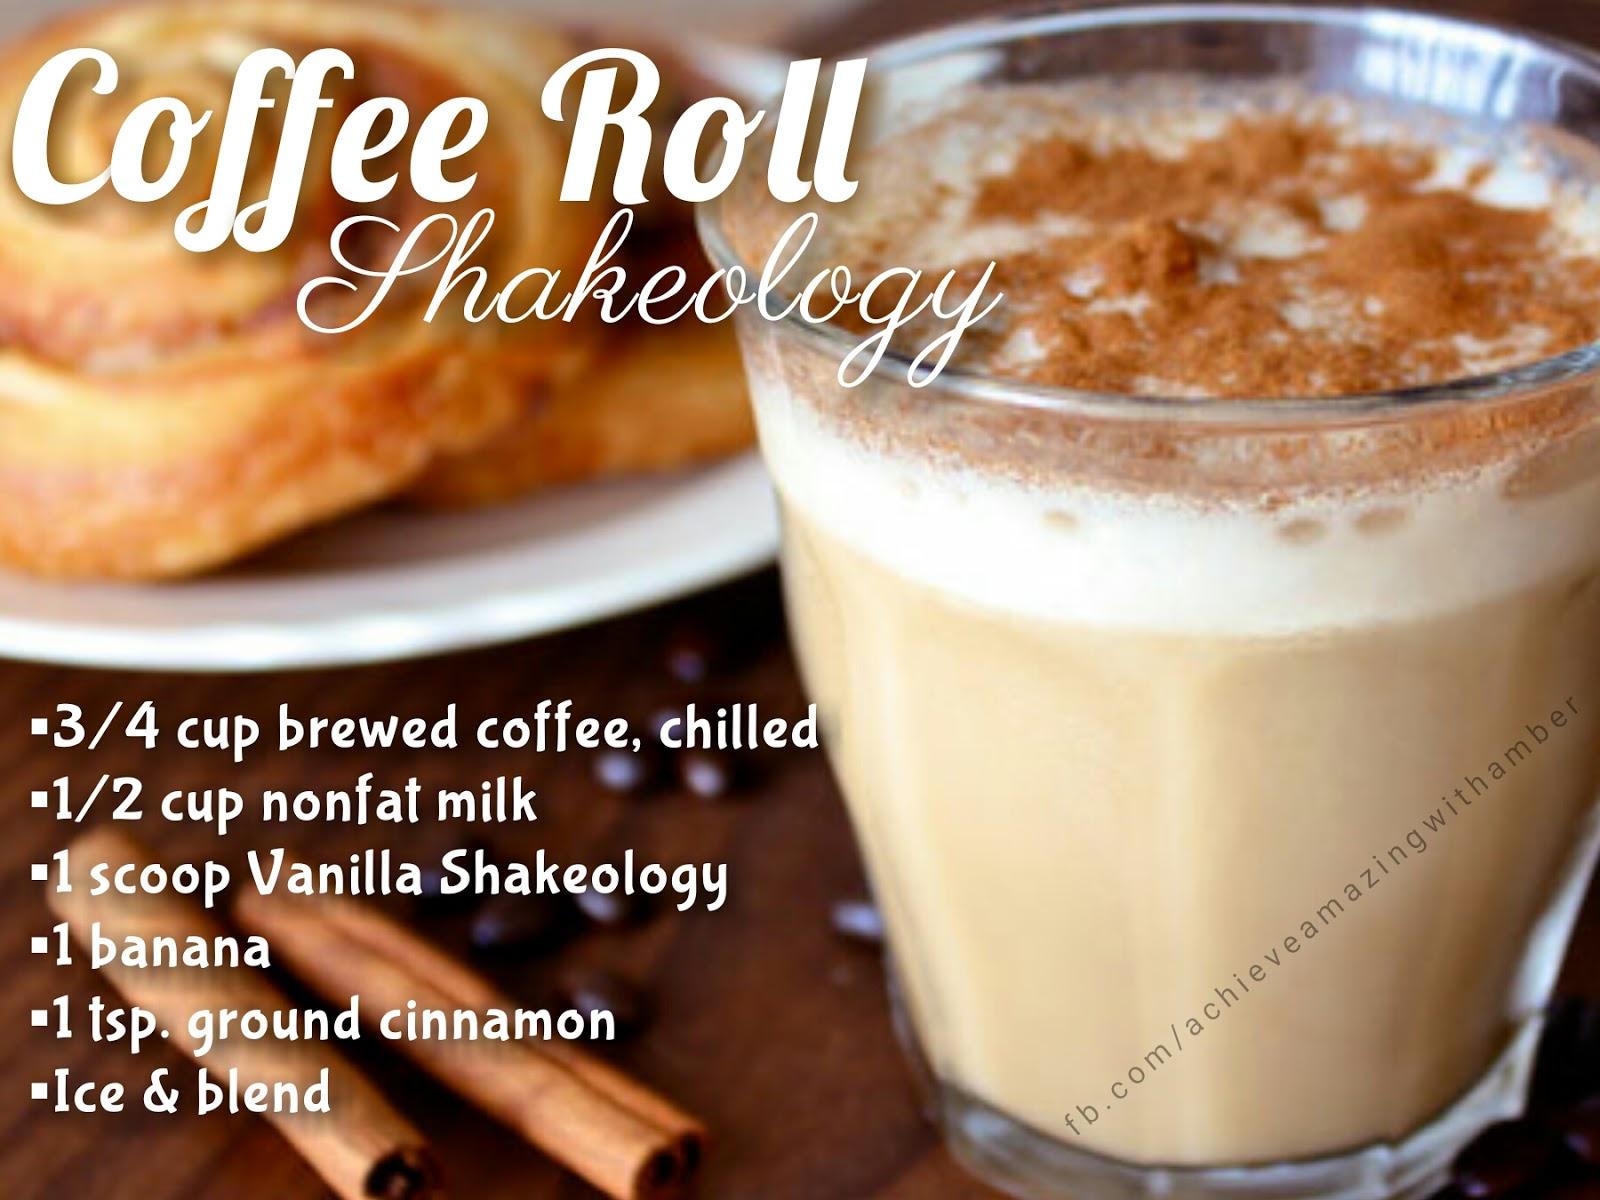 Vegan Cafe Latte Shakeology Recipes